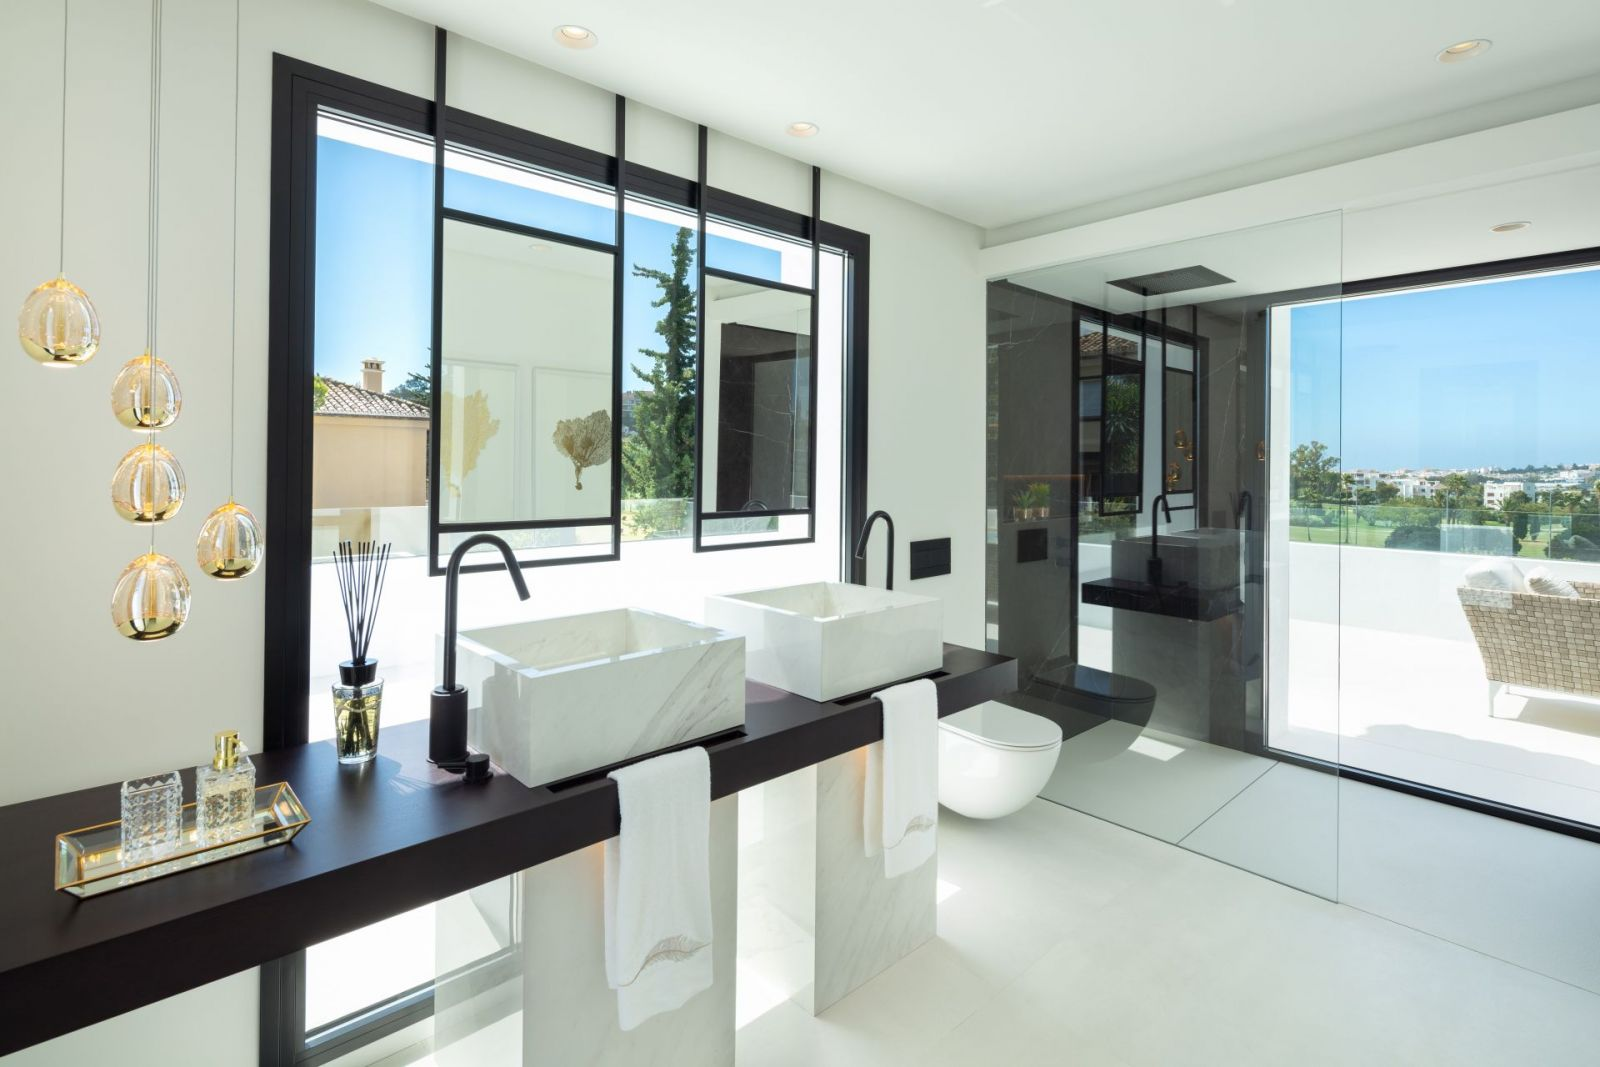 Luxury Villas For Sale In Nueva Andalucia